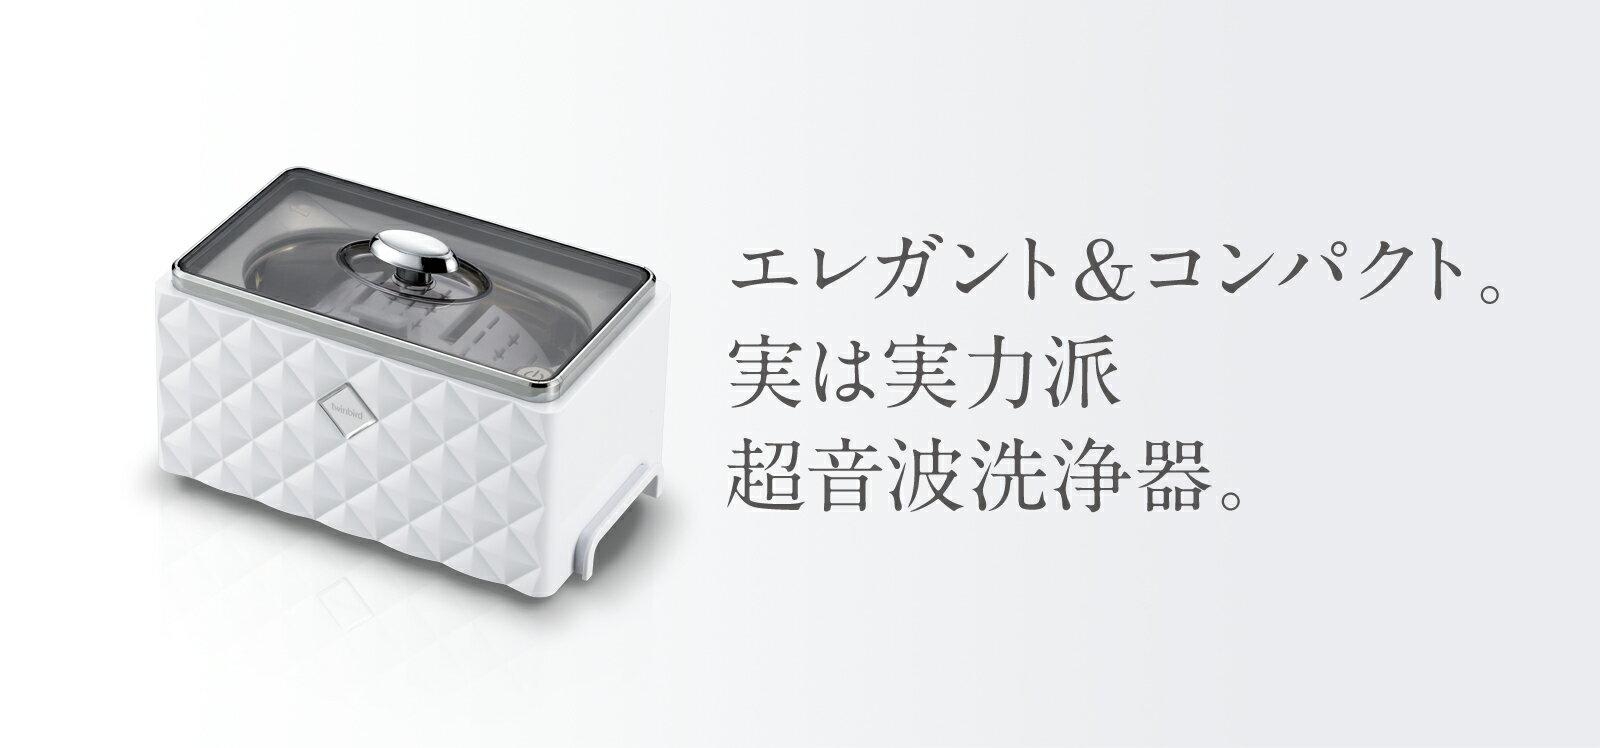 TWINBIRD ツインバード 超音波洗浄器 EC-4548W